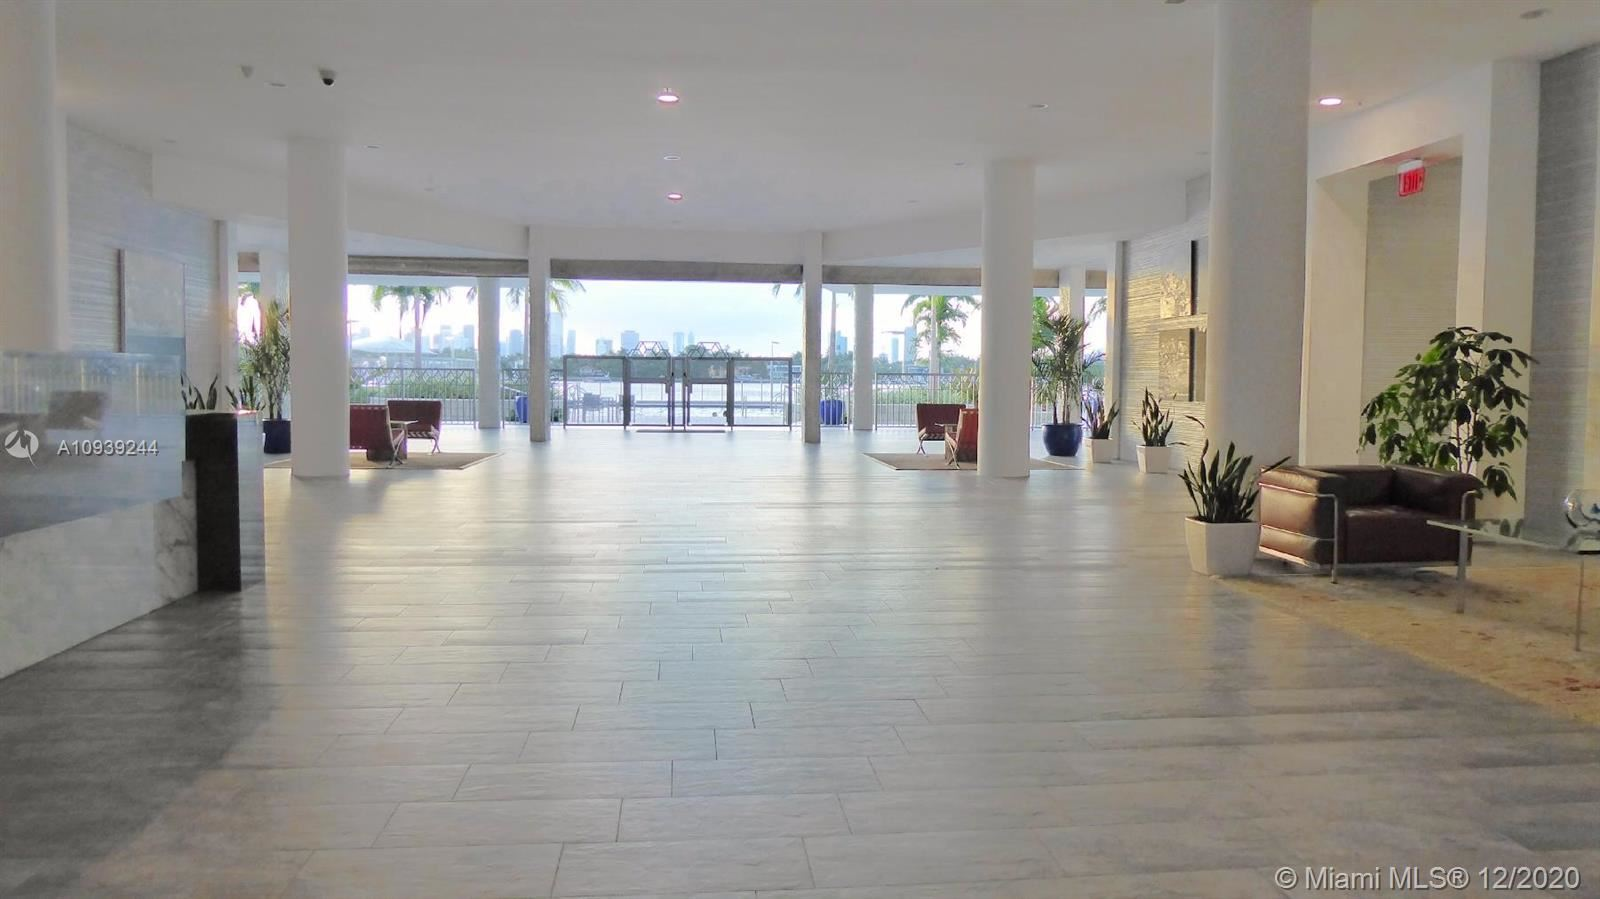 800 West Ave #410, Miami Beach, FL 33139 - #: A10939244